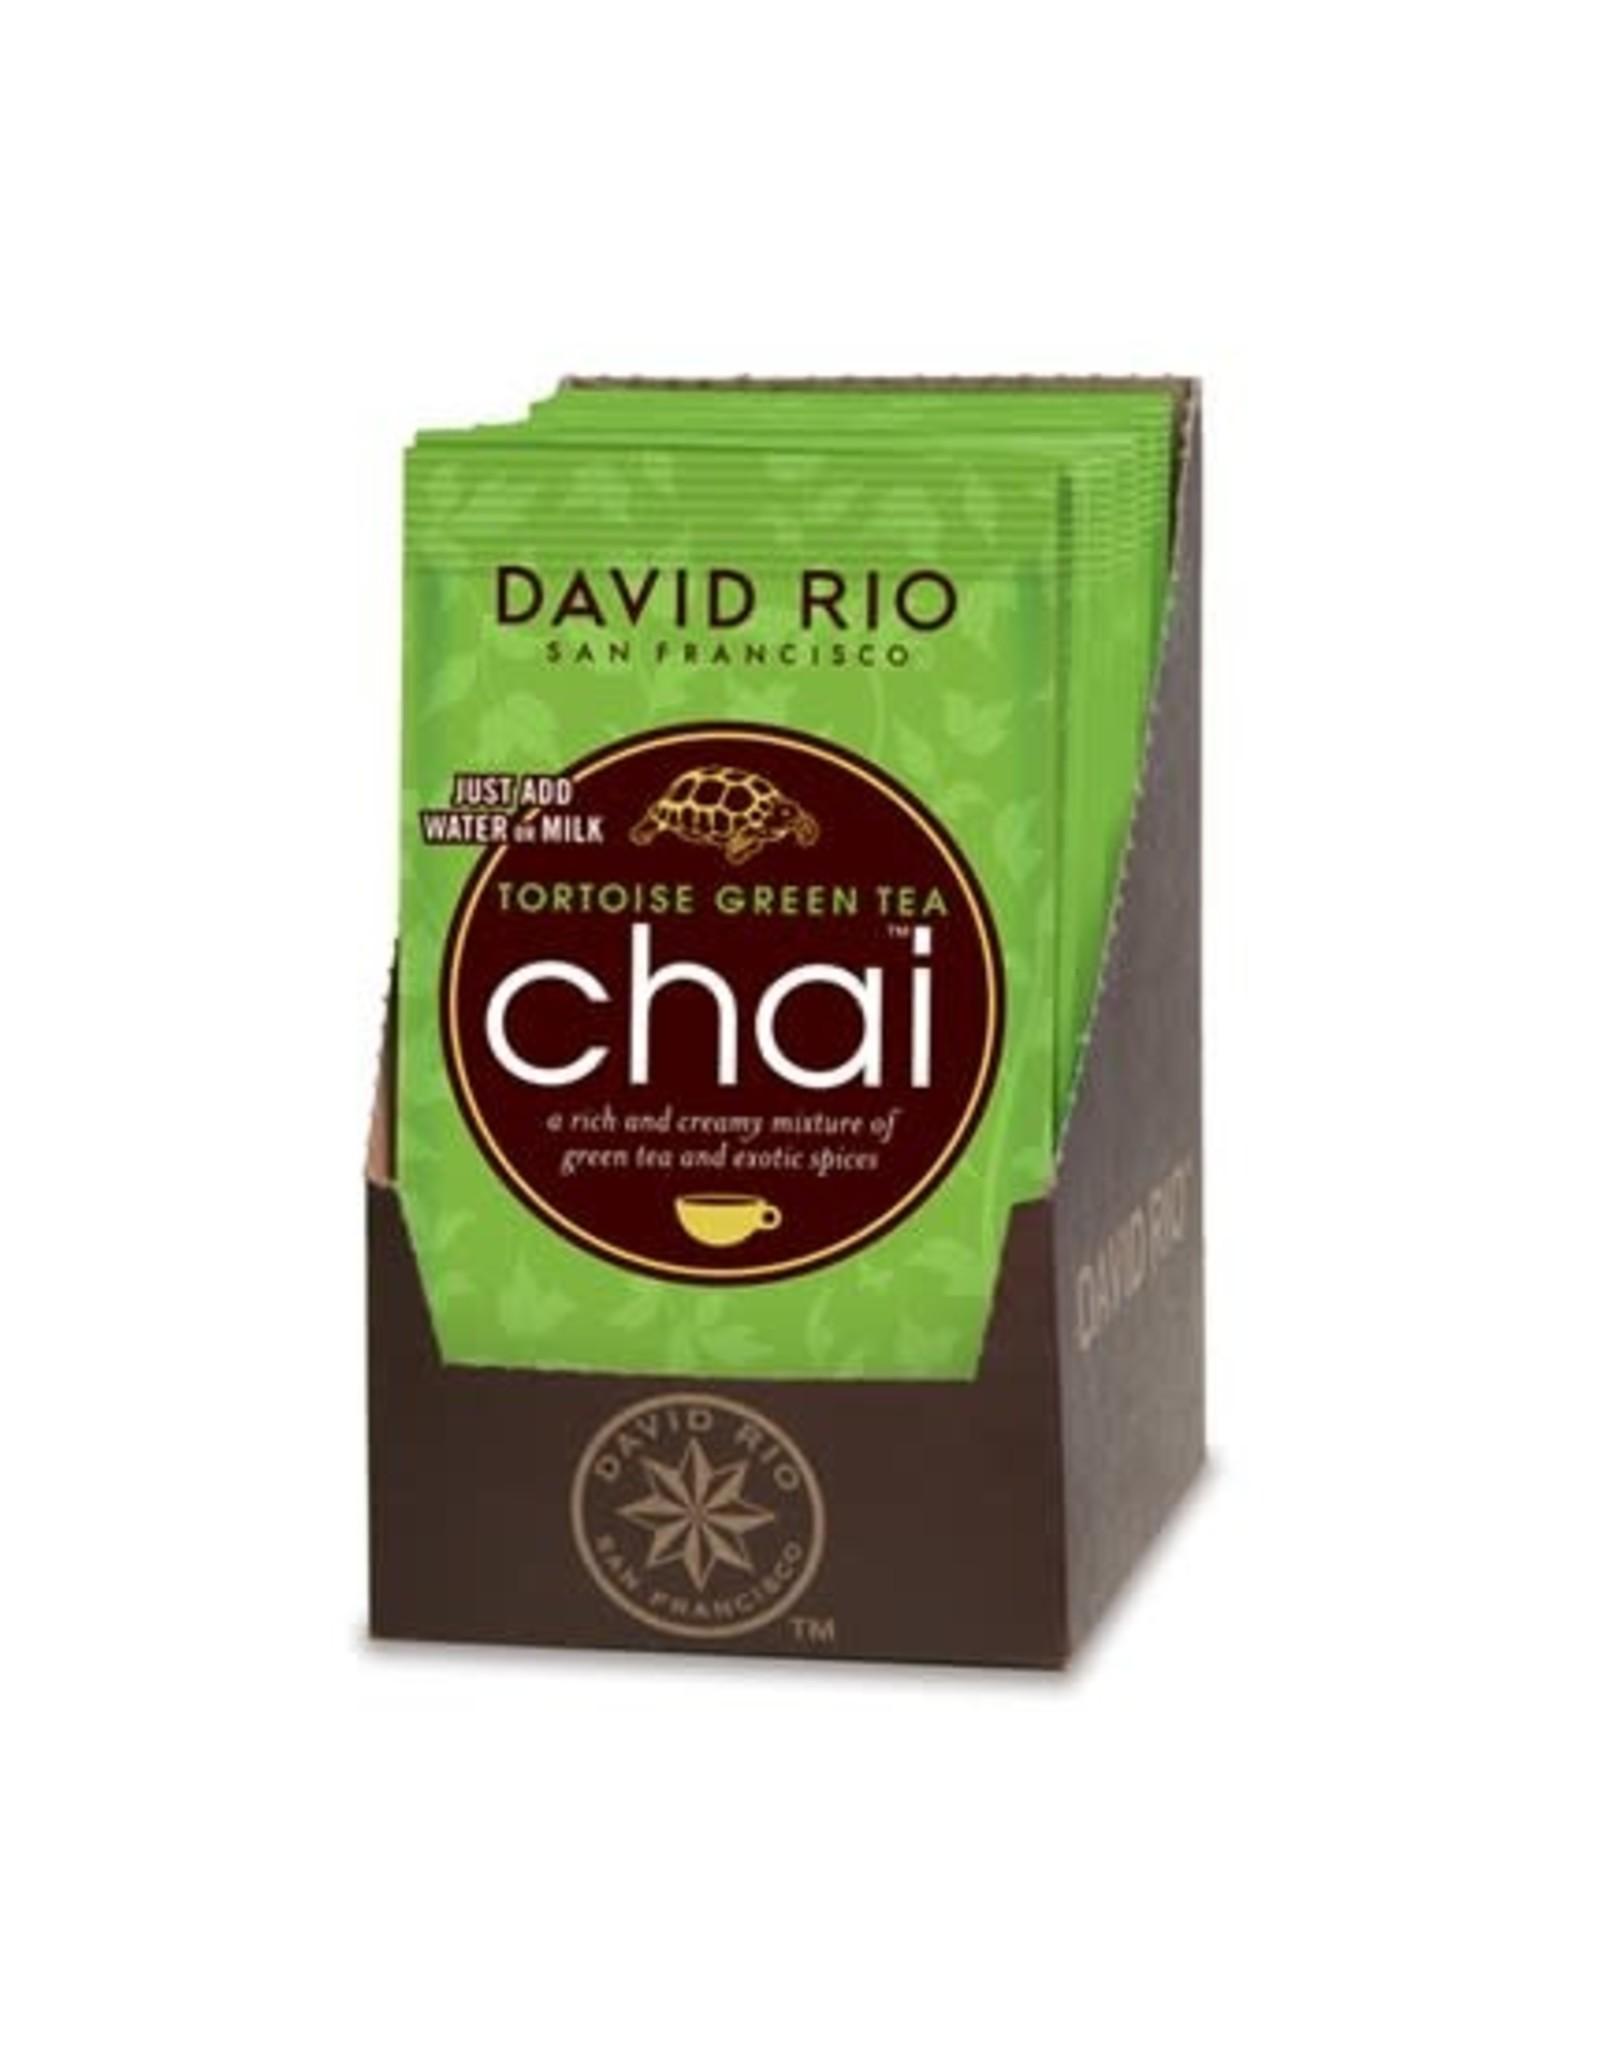 Coffee Master Chai Tea, Tortoise Green, 1 oz